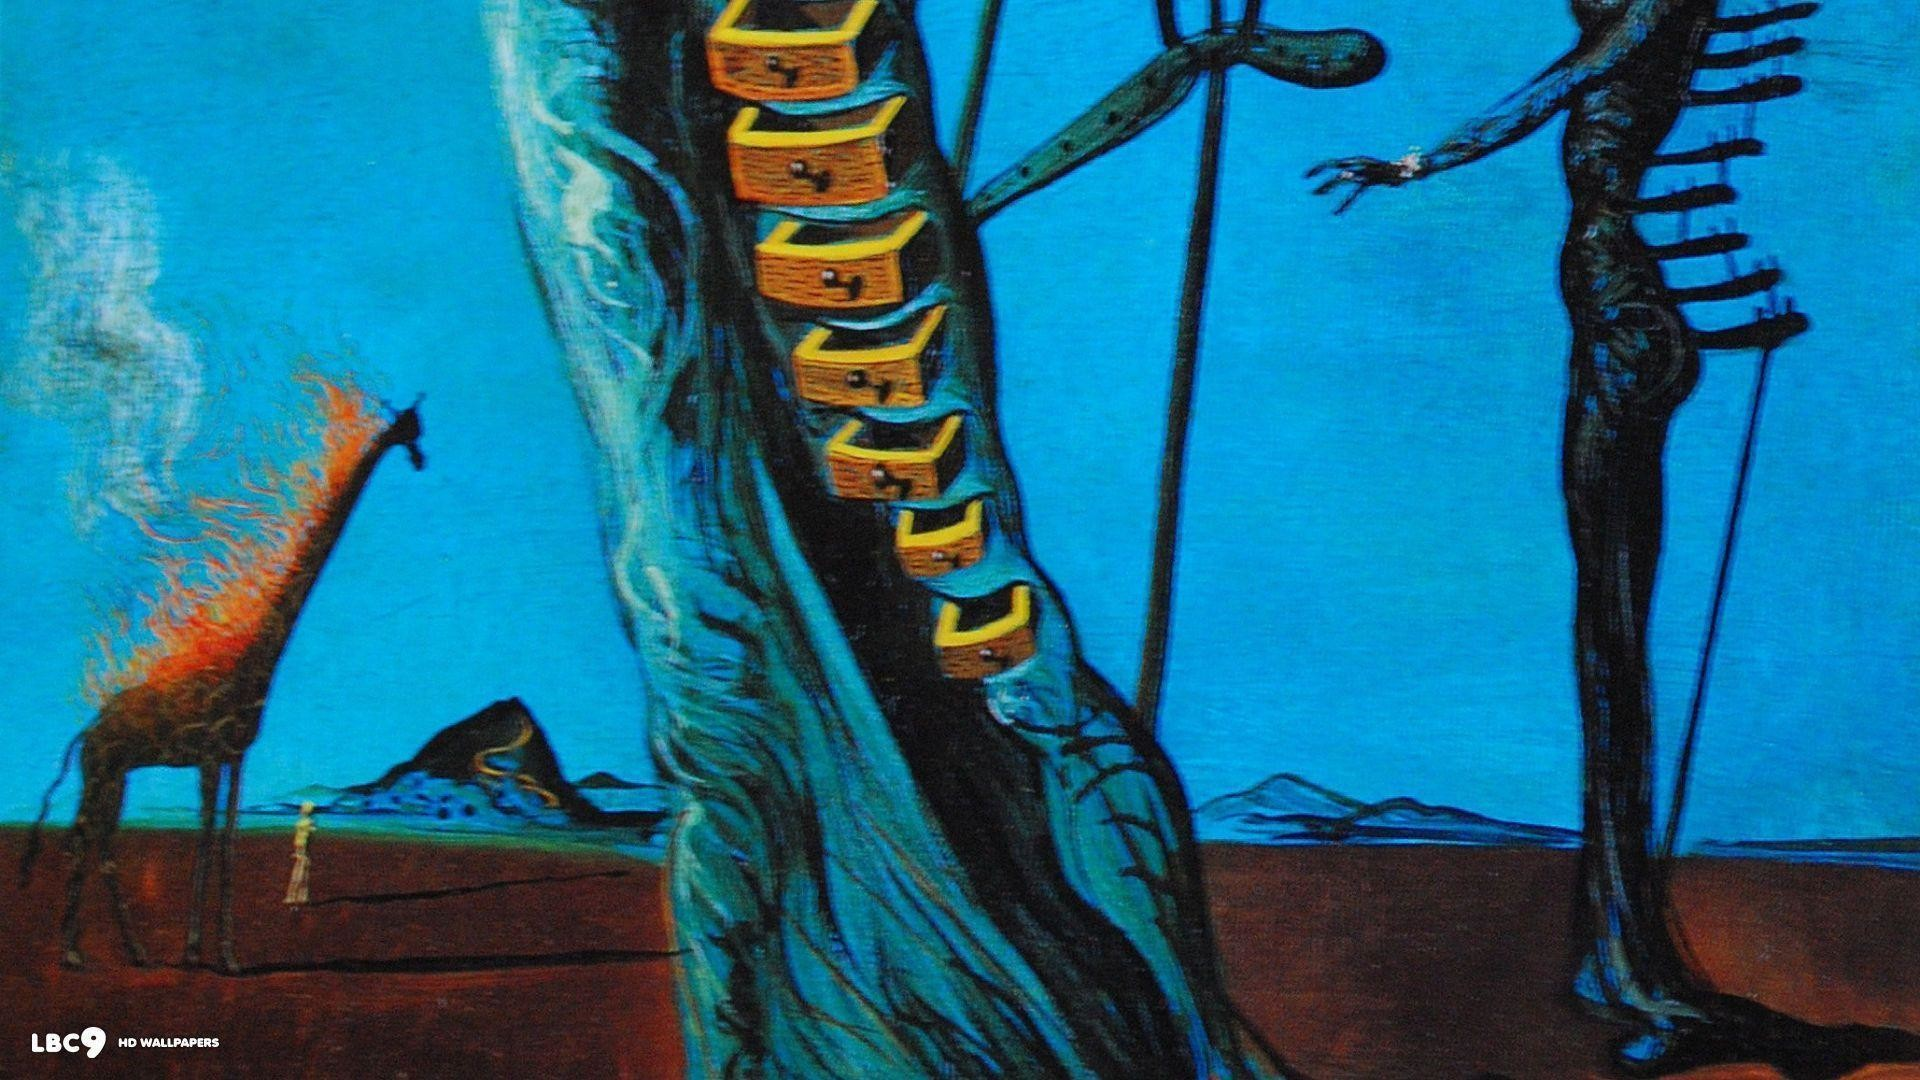 salvador dali wallpaper 3/38 | paintings hd backgrounds